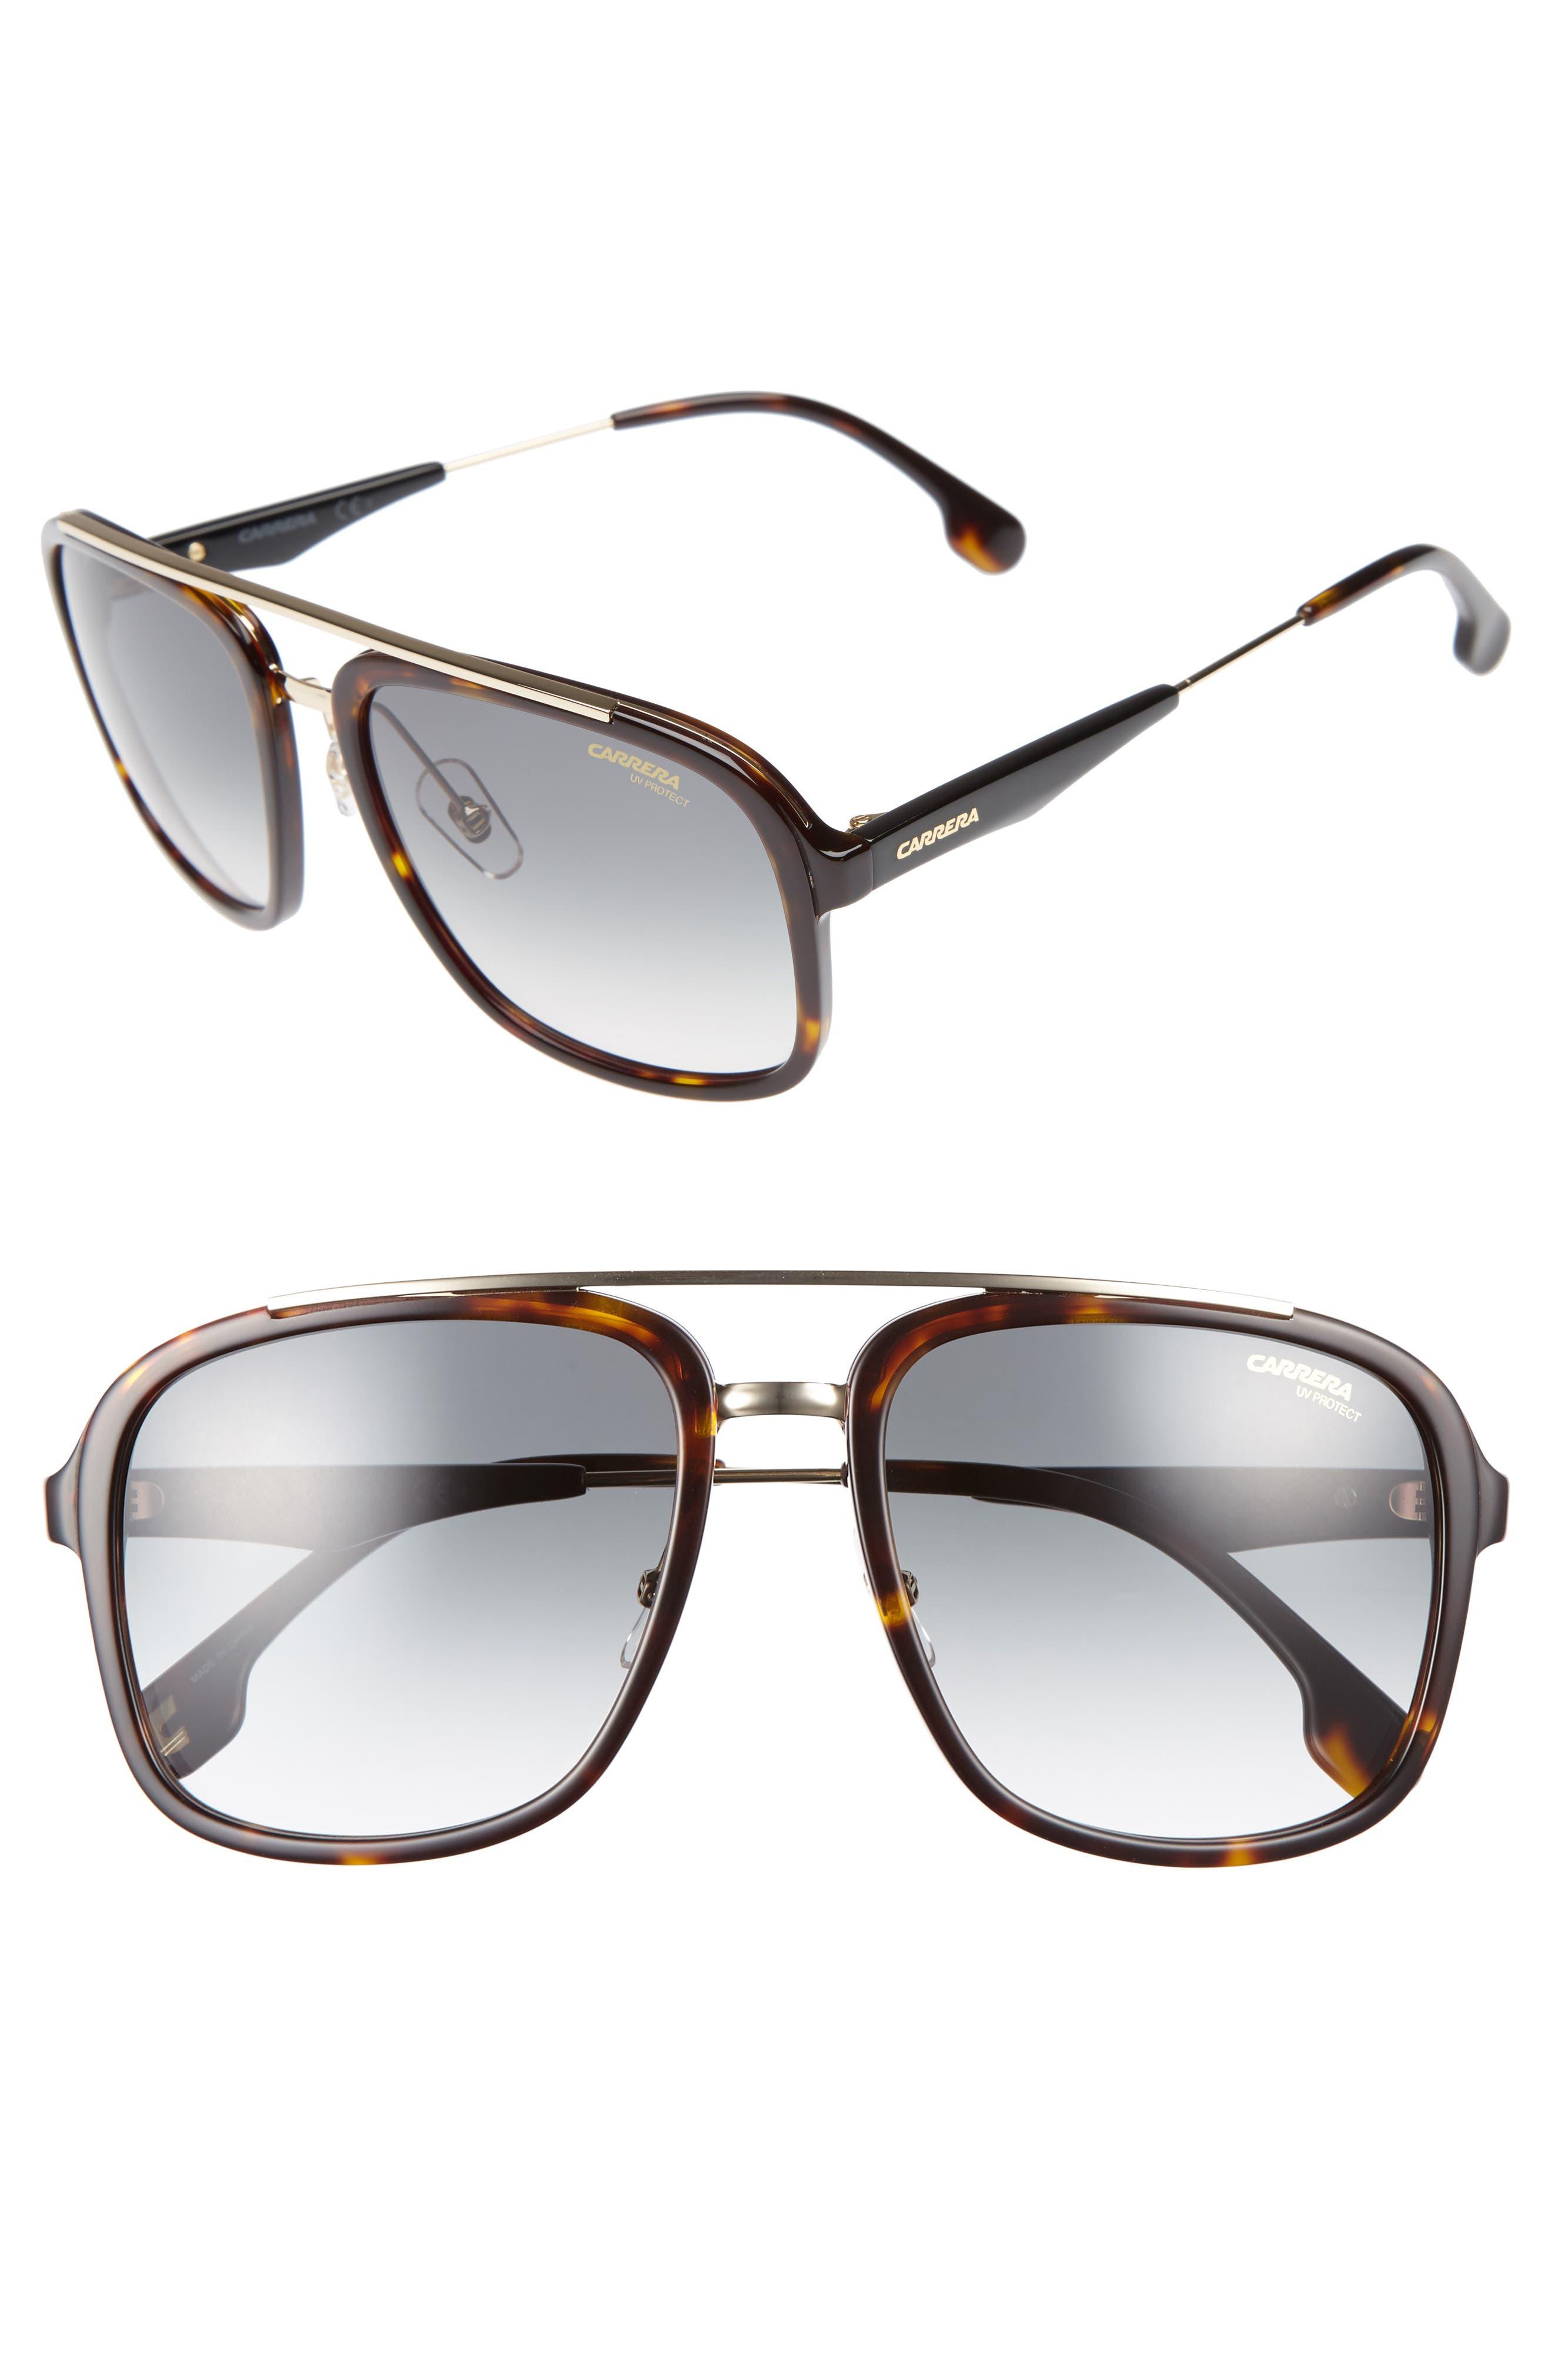 Carrera Eyewear 57mm Sunglasses